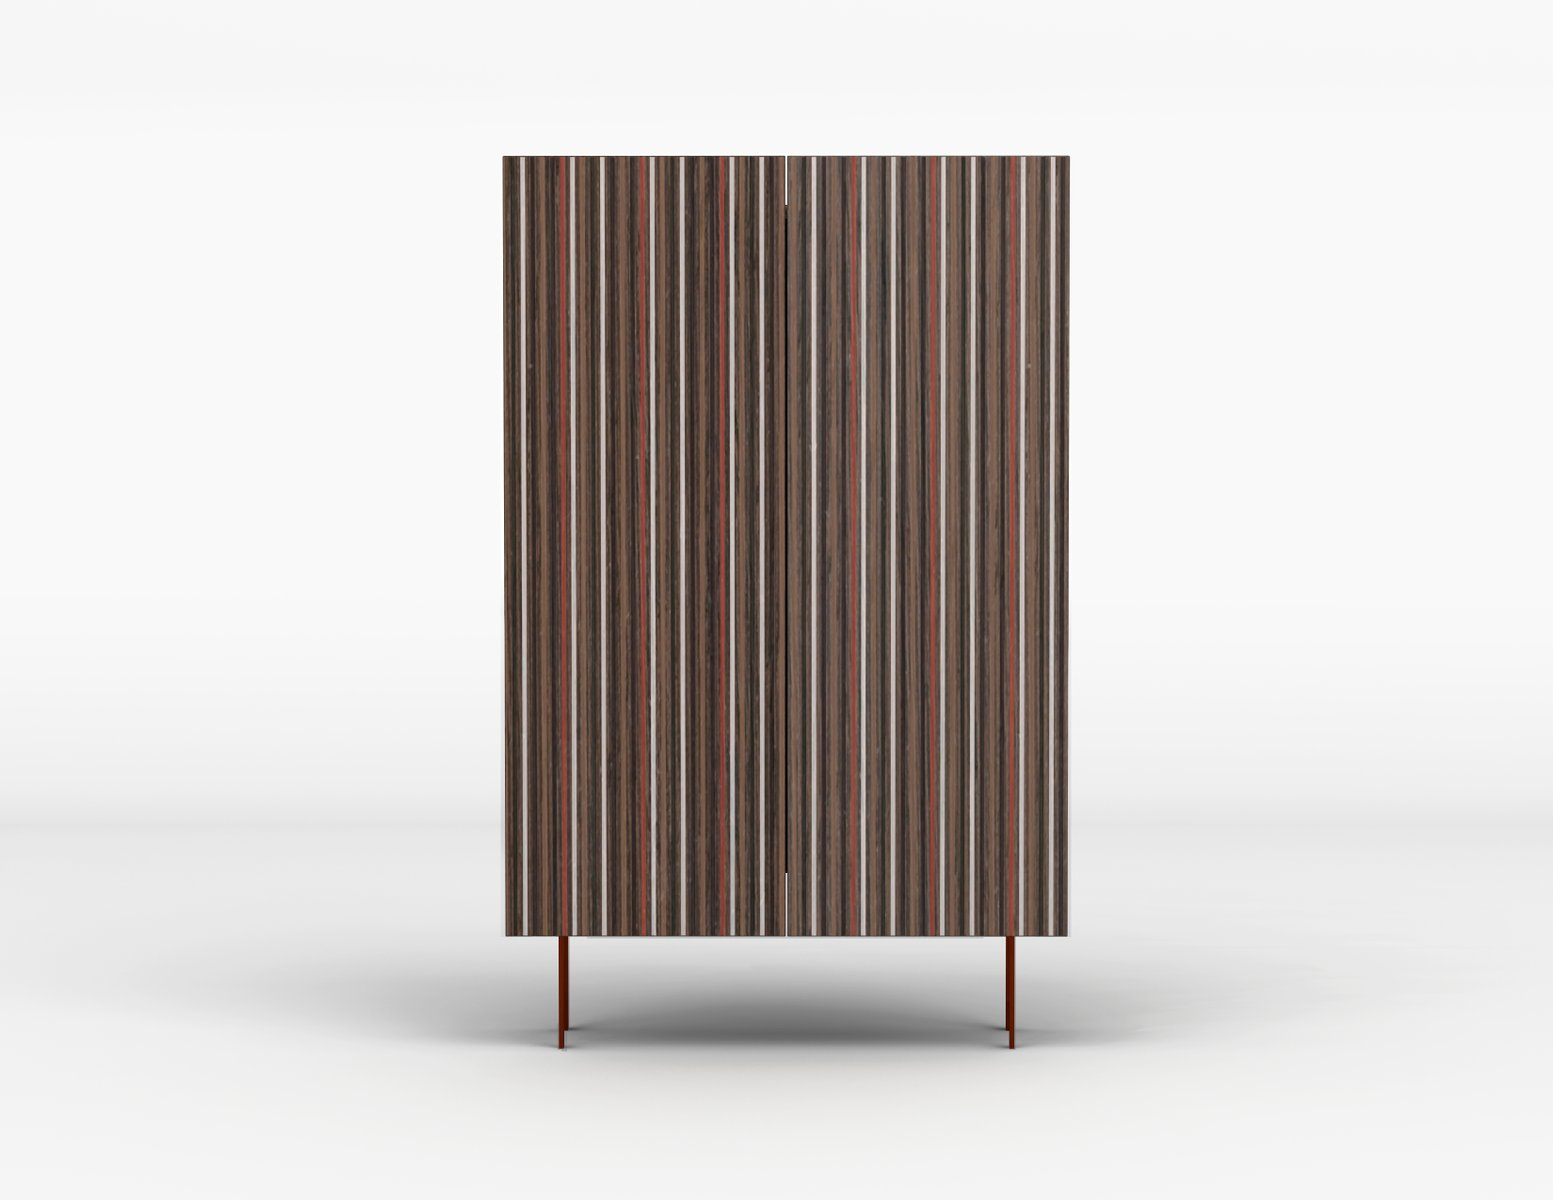 meradi garderobe von garth roberts aws velbert. Black Bedroom Furniture Sets. Home Design Ideas